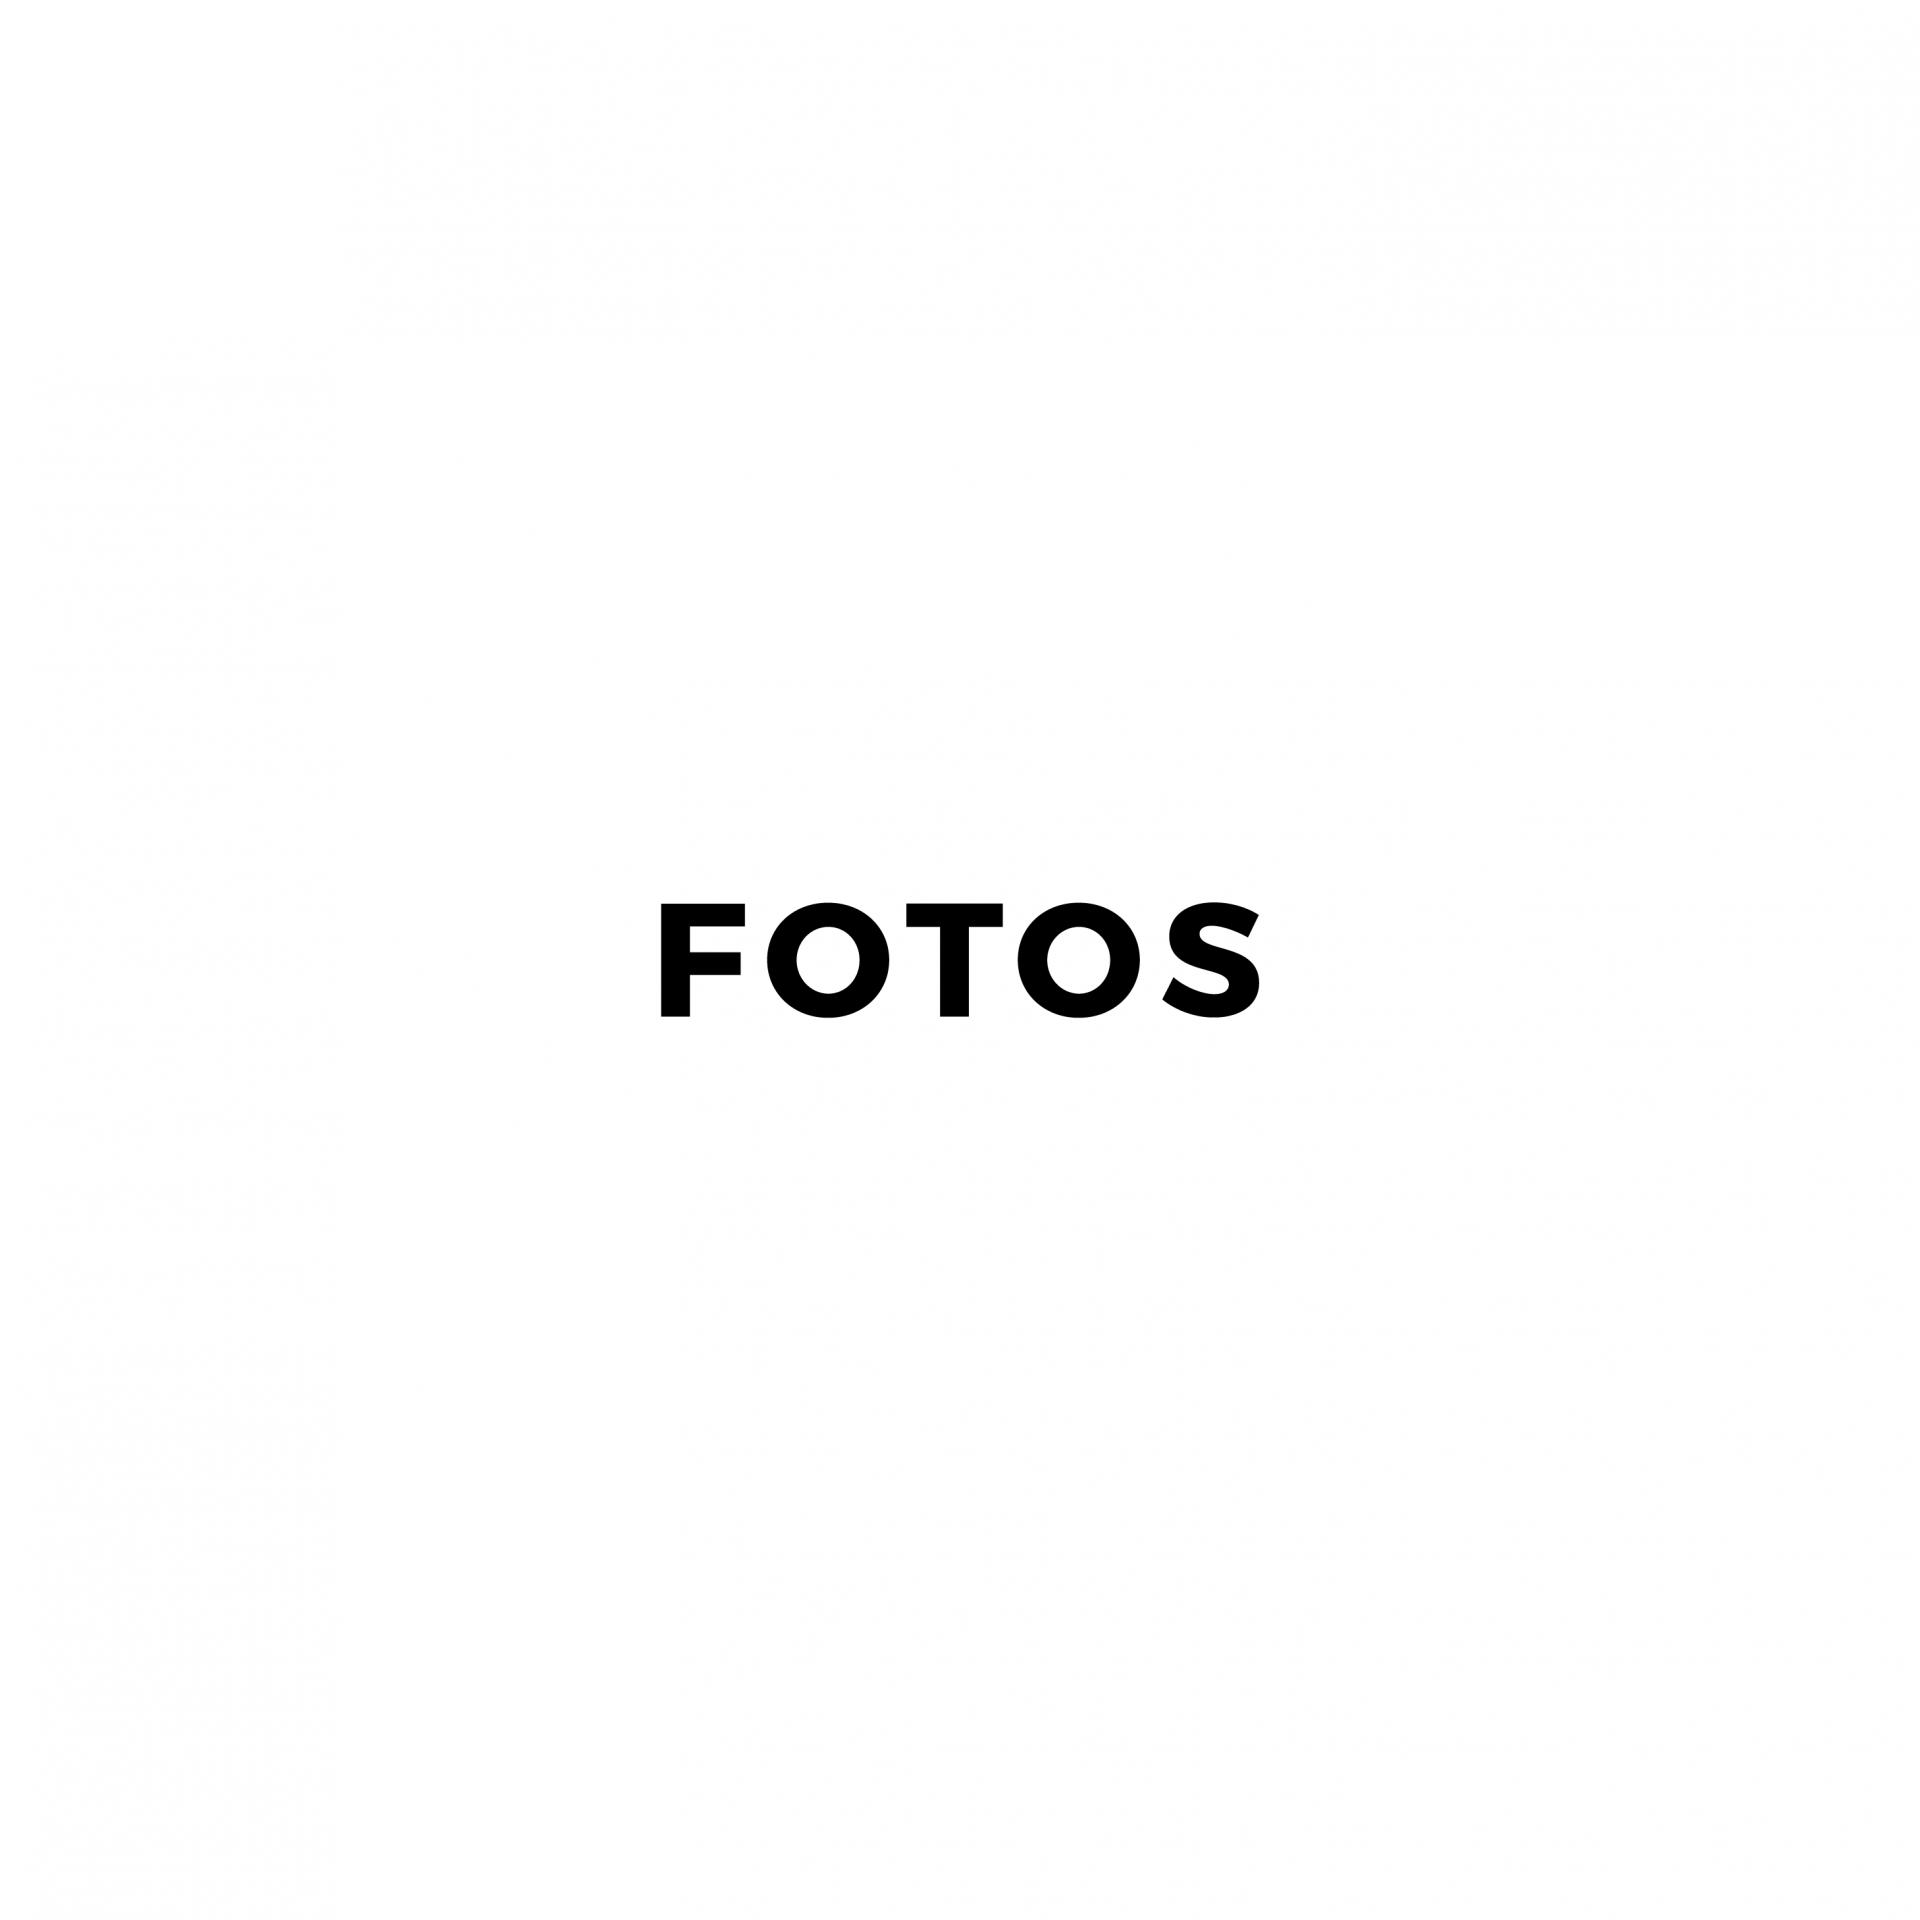 Fotos 02